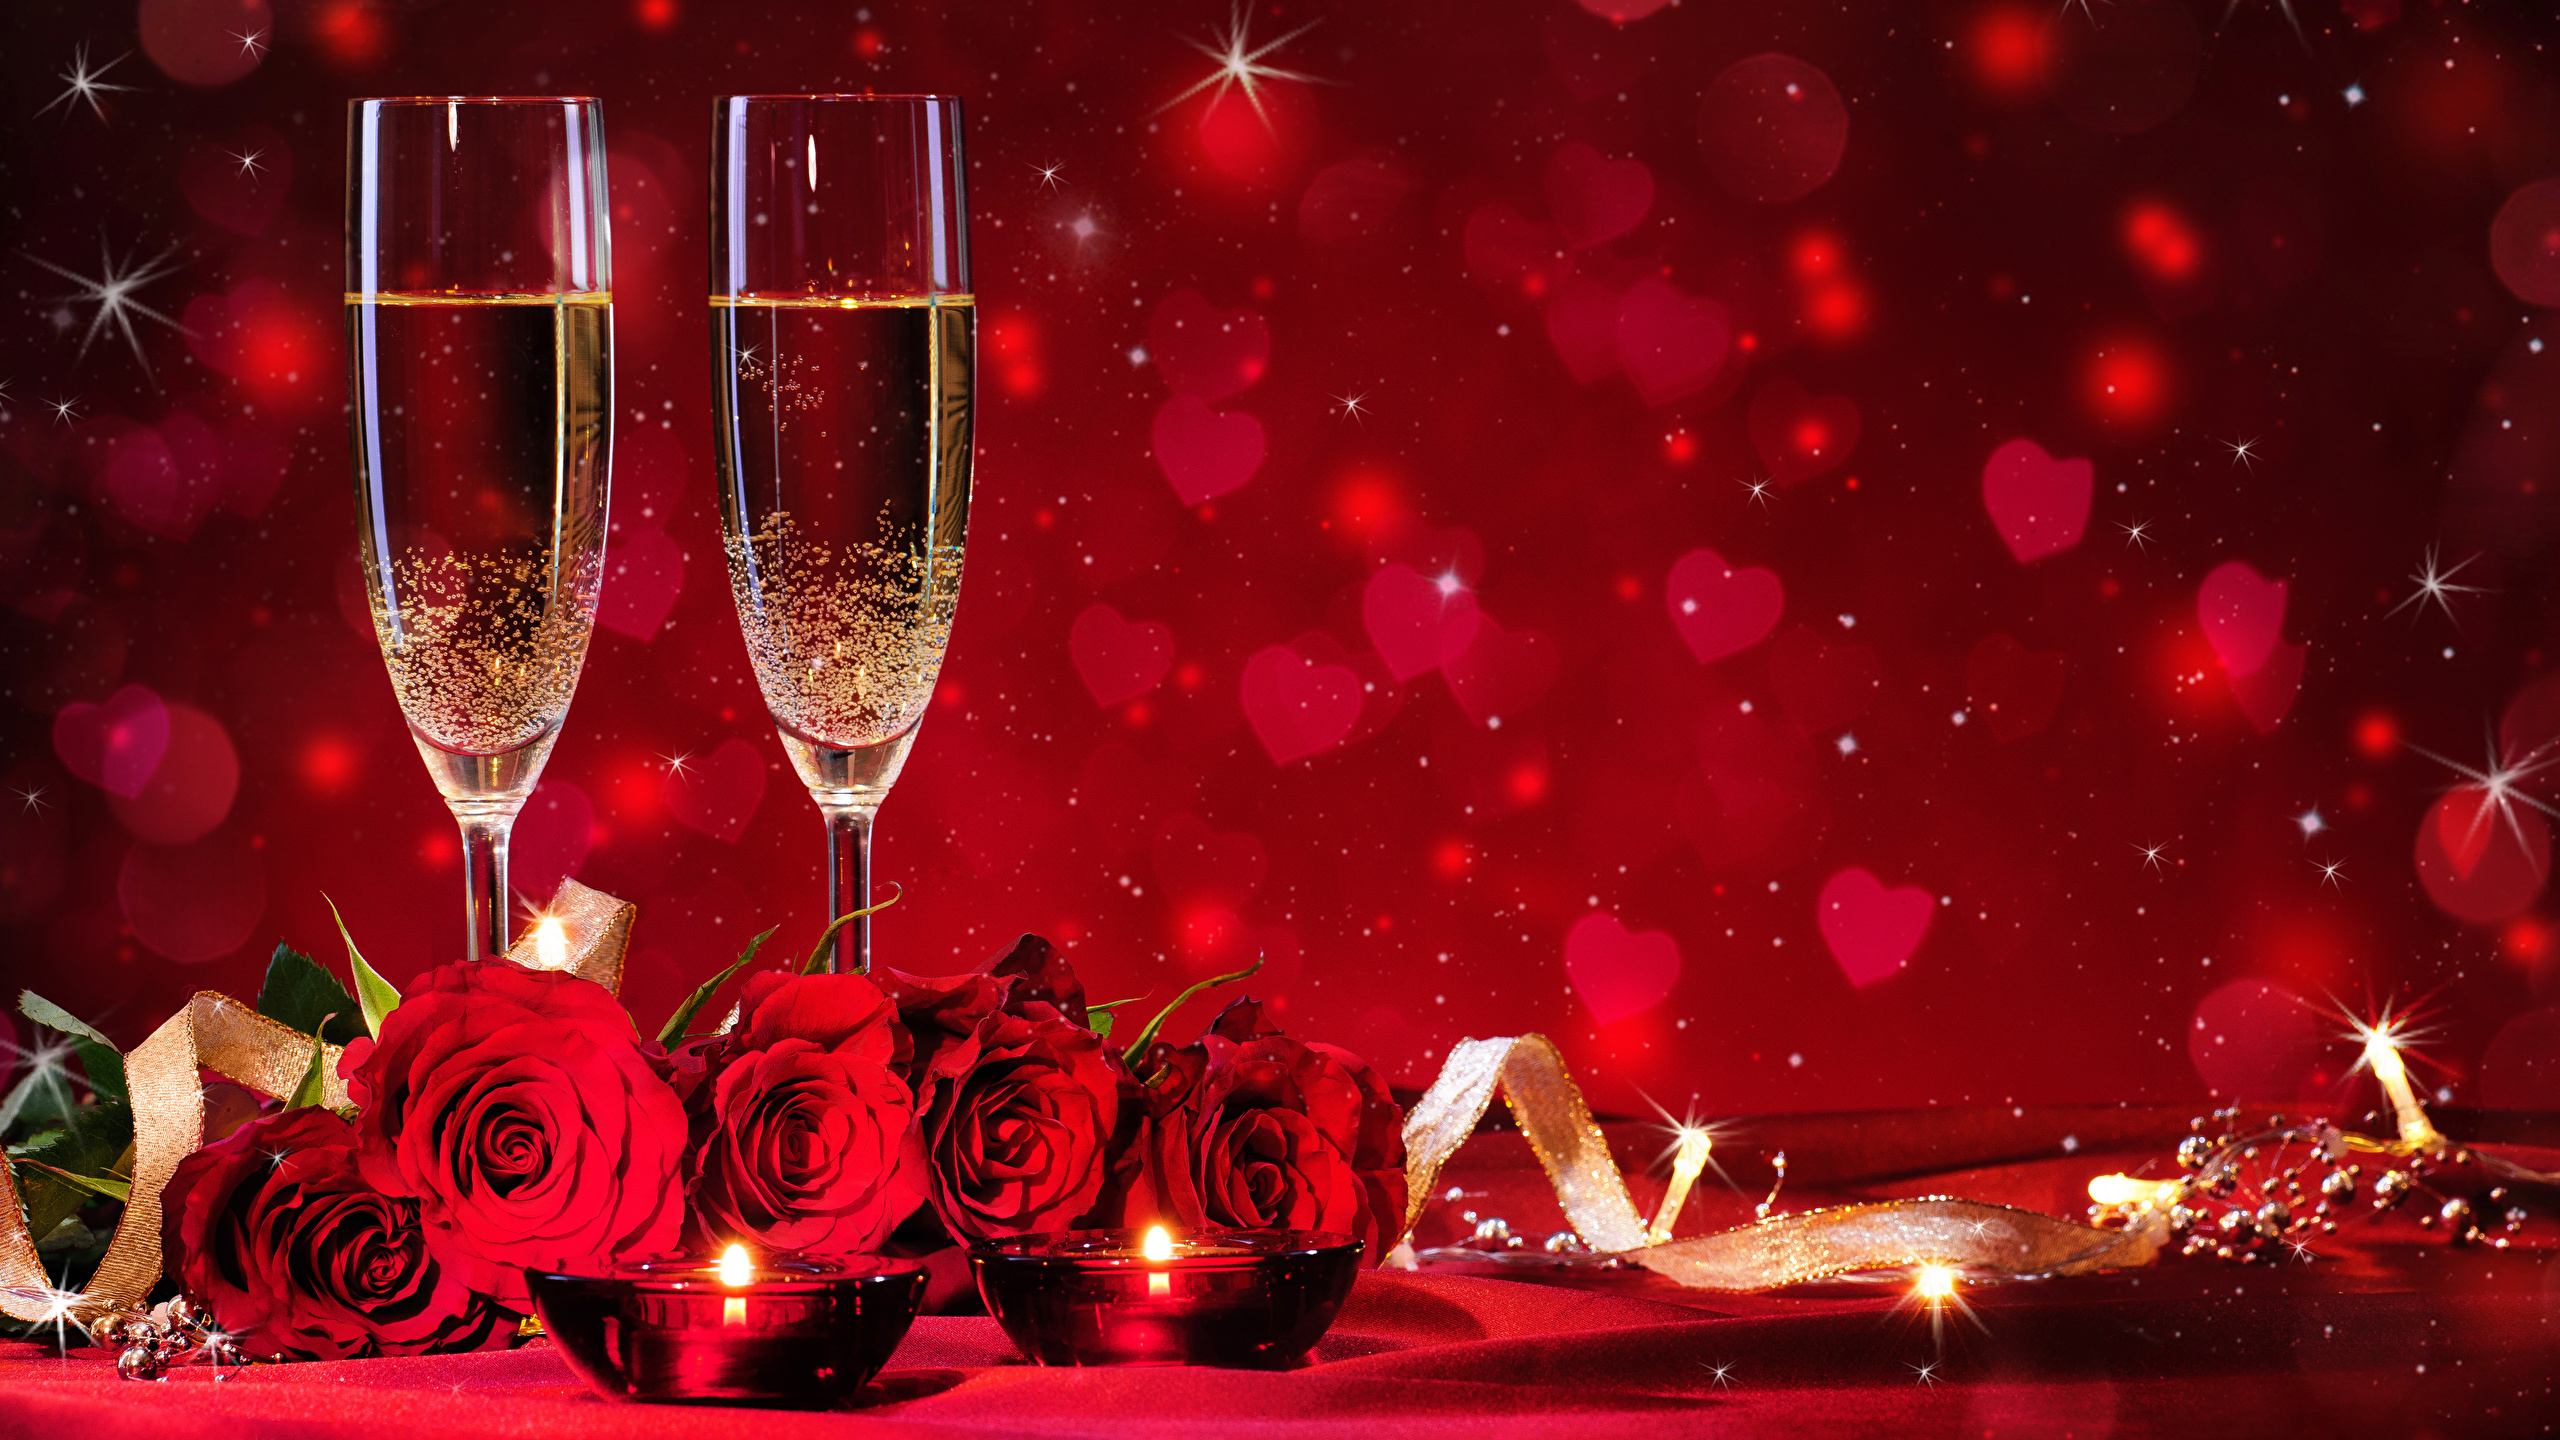 Fonds Decran 2560x1440 Saint Valentin Roses Bougies